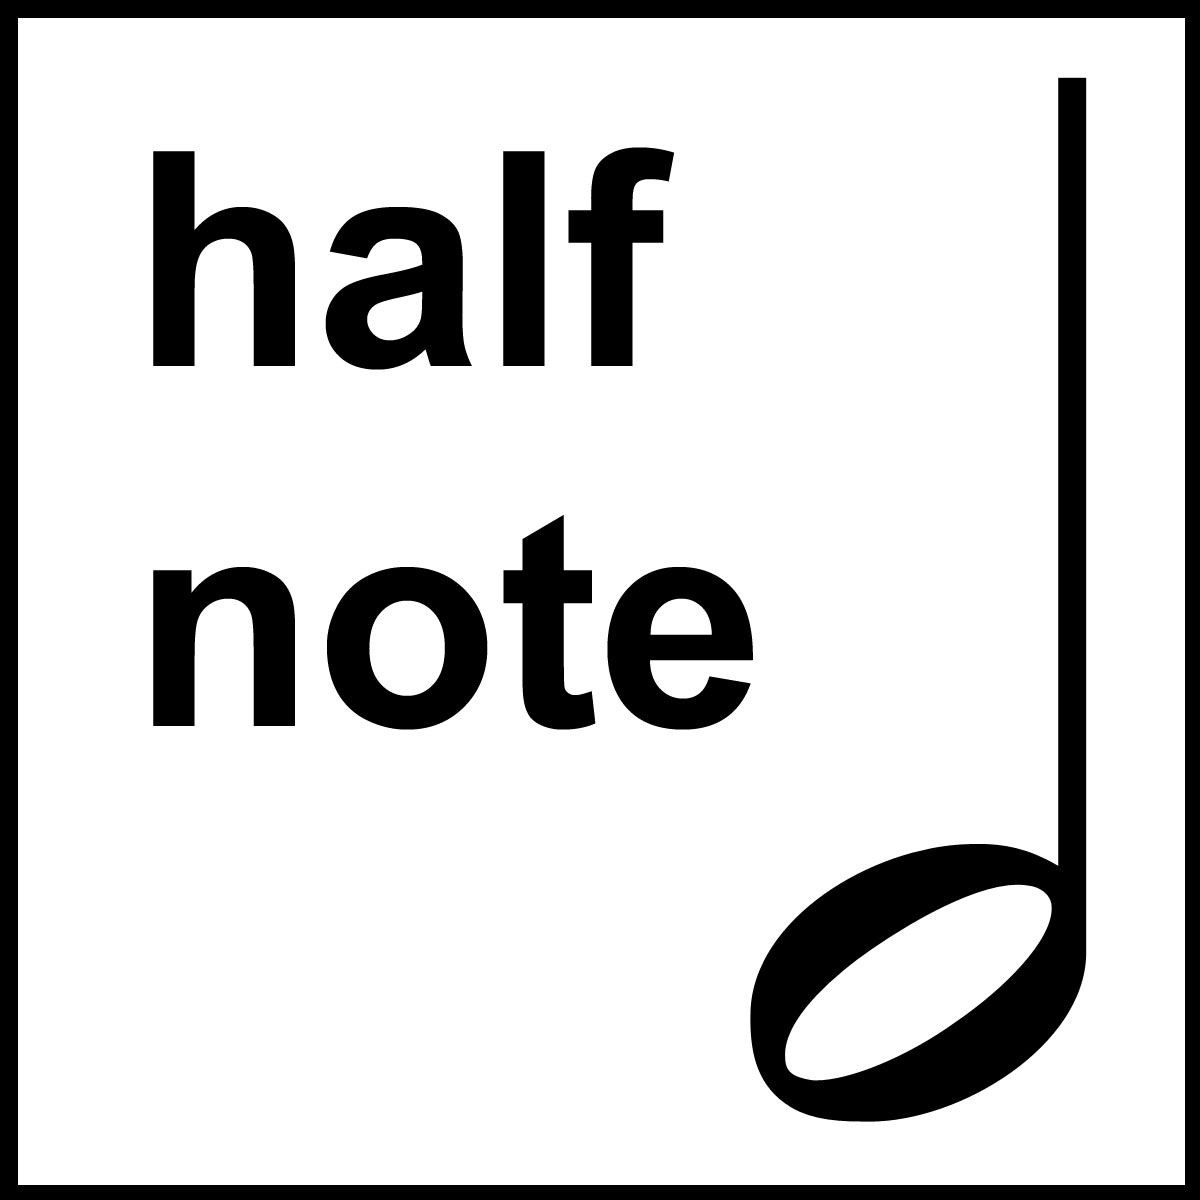 Musician clipart music lesson Clip Tes B&W Notes Music